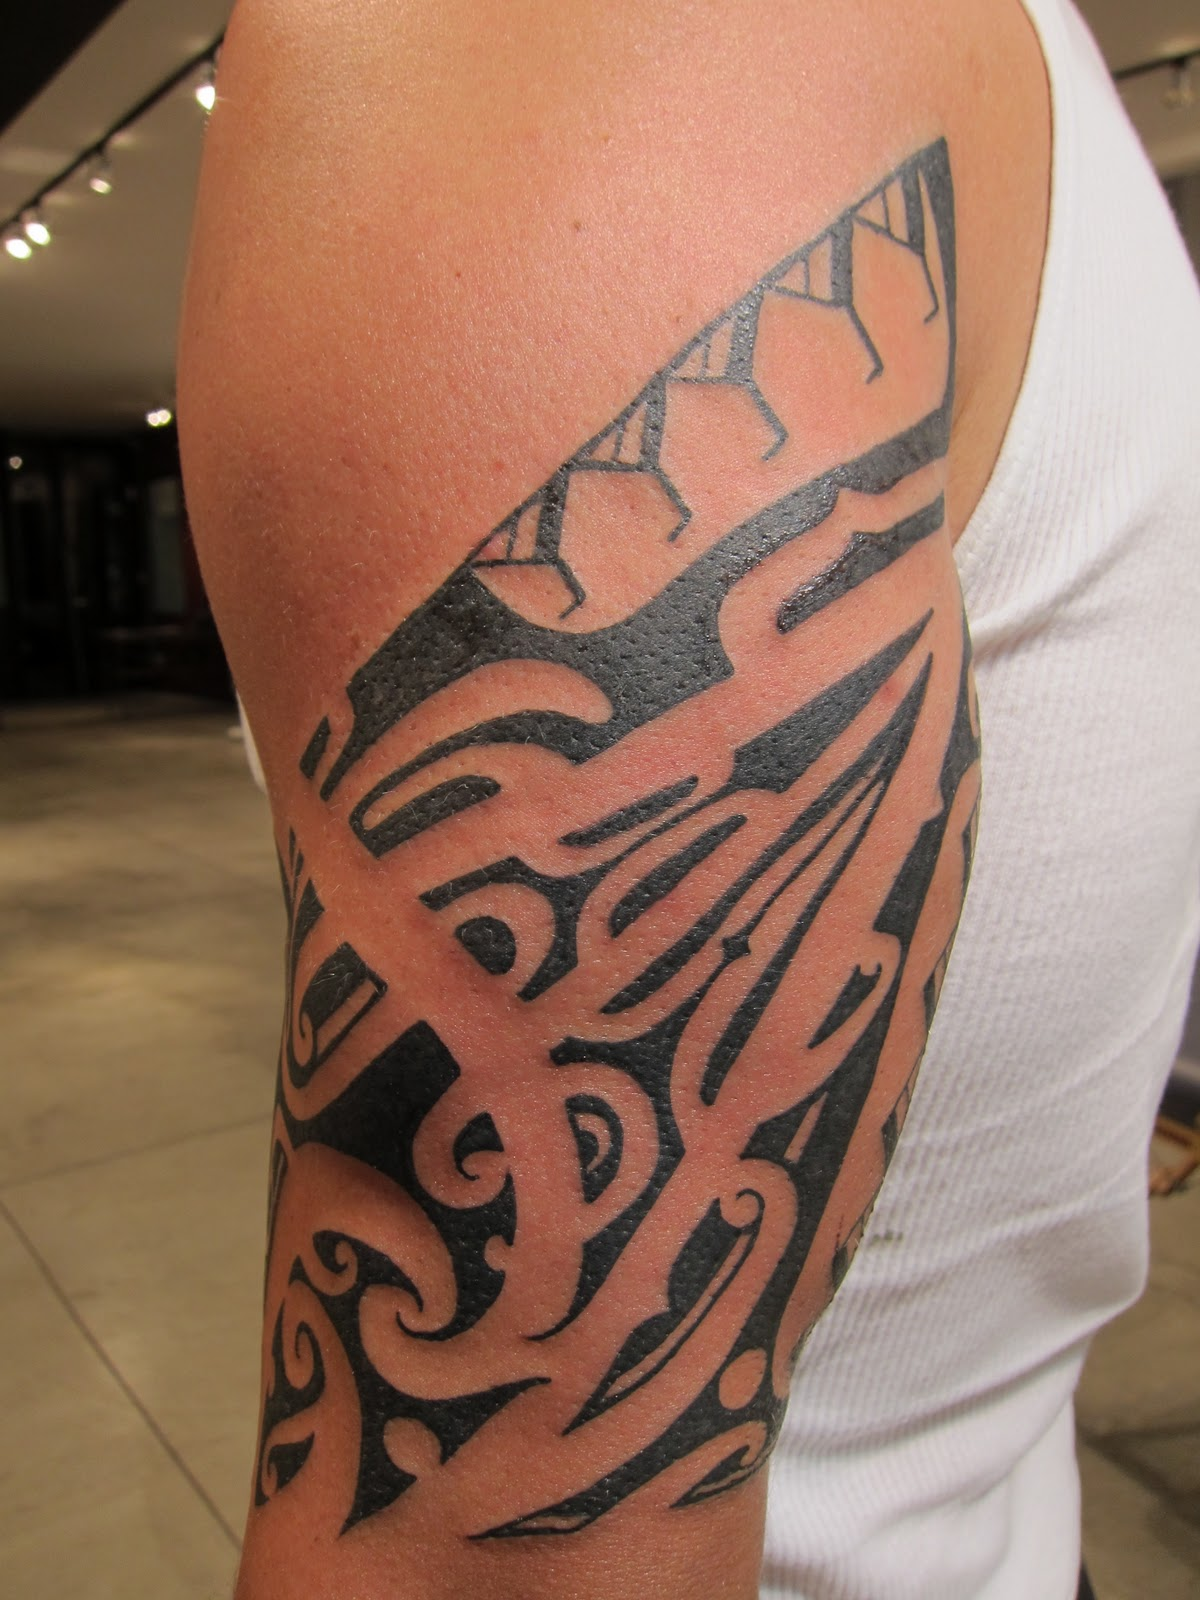 History of polynesian tattoos slodive tattoos for Polynesian tattoo designs